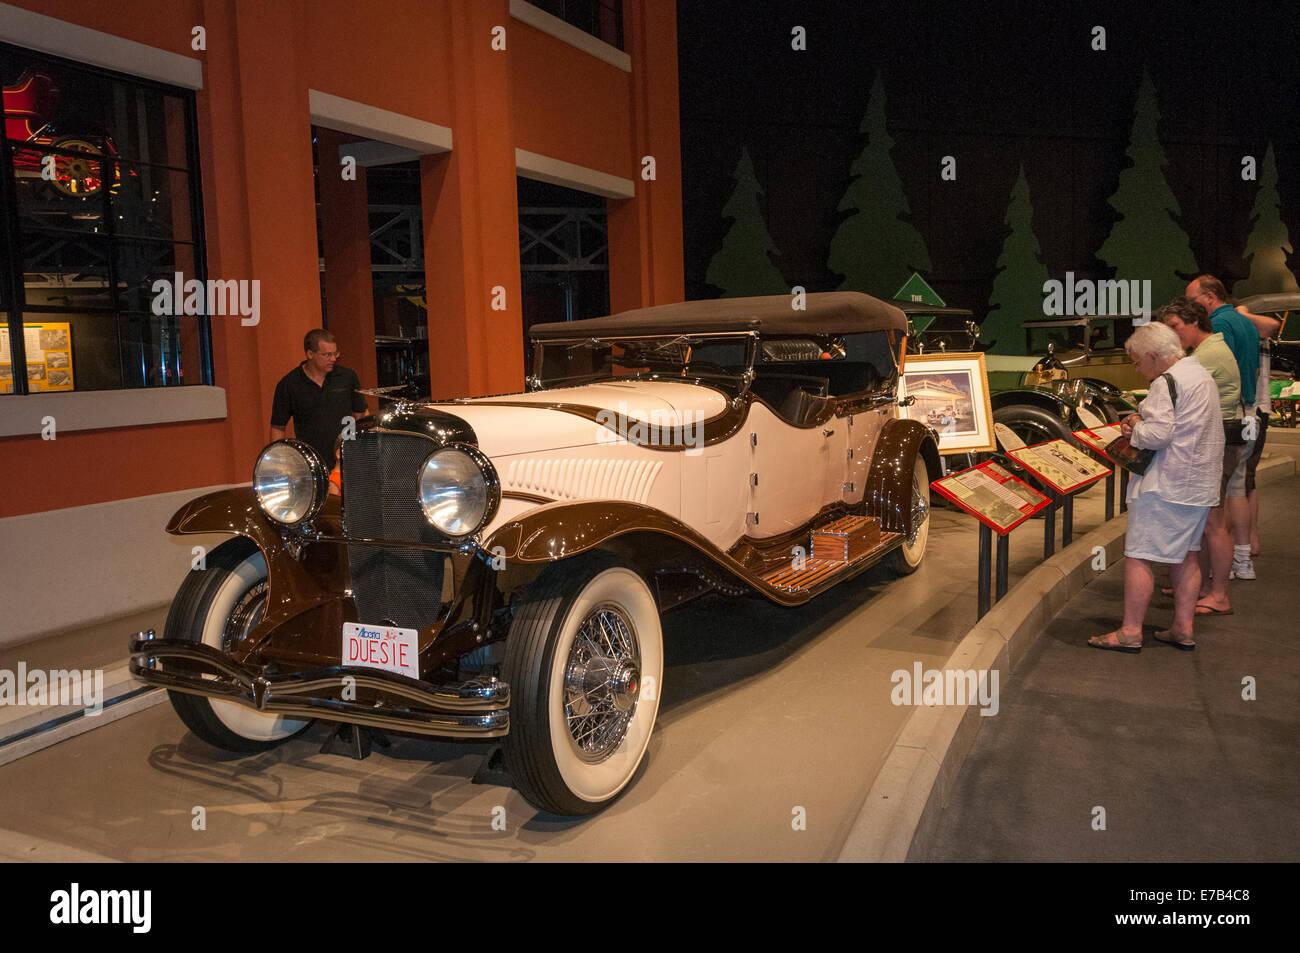 Elk203-5681 Canada, Alberta, Wetaskiwin, Reynolds-Alberta Museum, vintage automobile - Stock Image